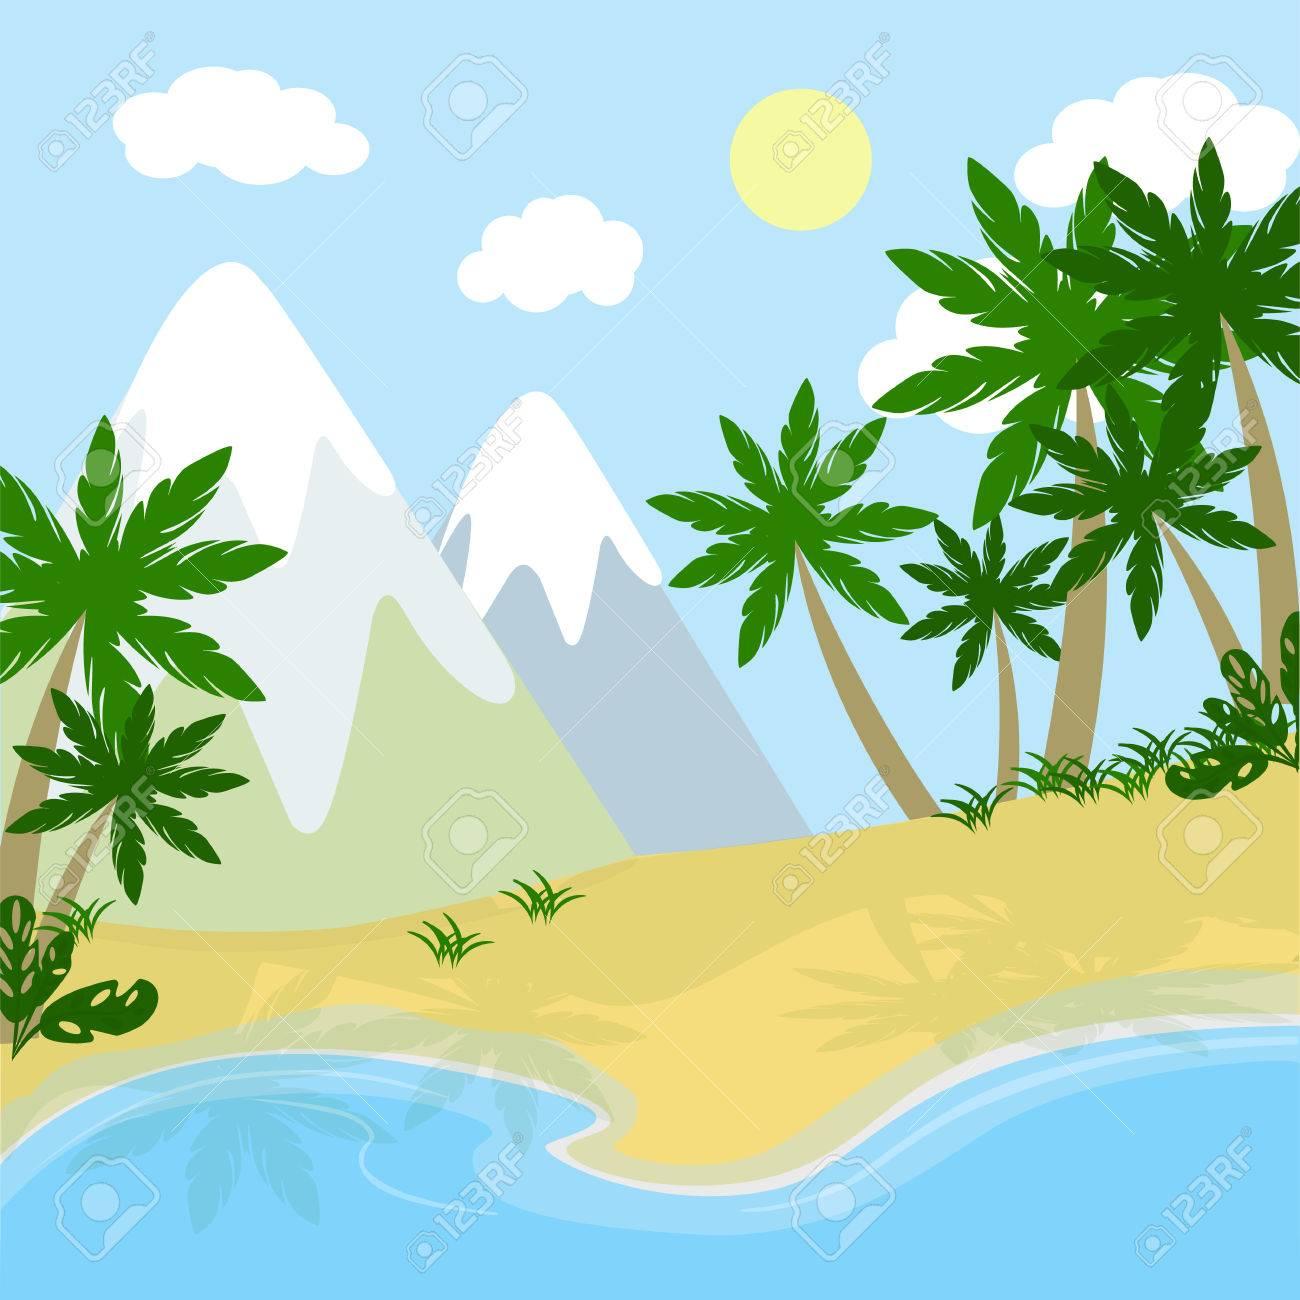 De Dibujos Animados Paisaje Prehistórico Ríos Montañas Y Playa Con